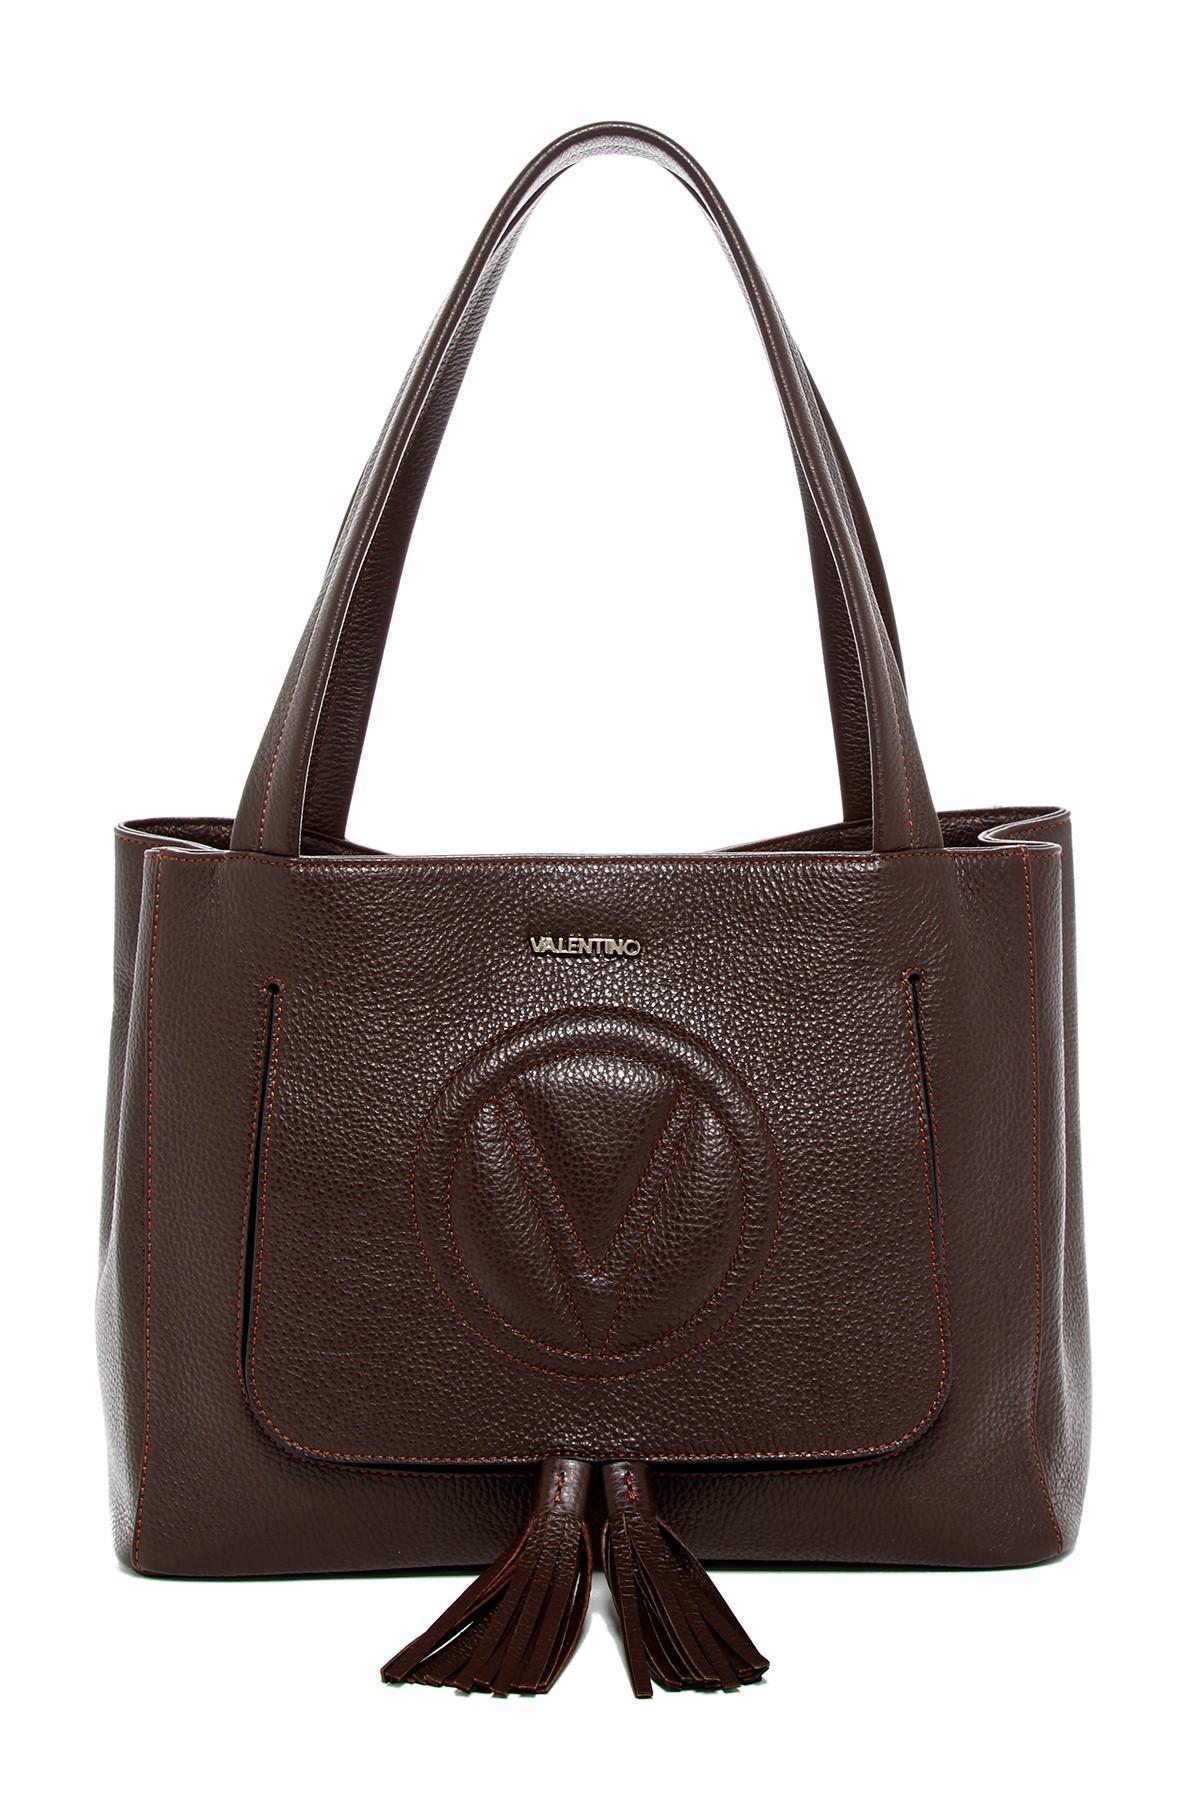 valentino by mario valentino estelle leather shoulder bag. Black Bedroom Furniture Sets. Home Design Ideas